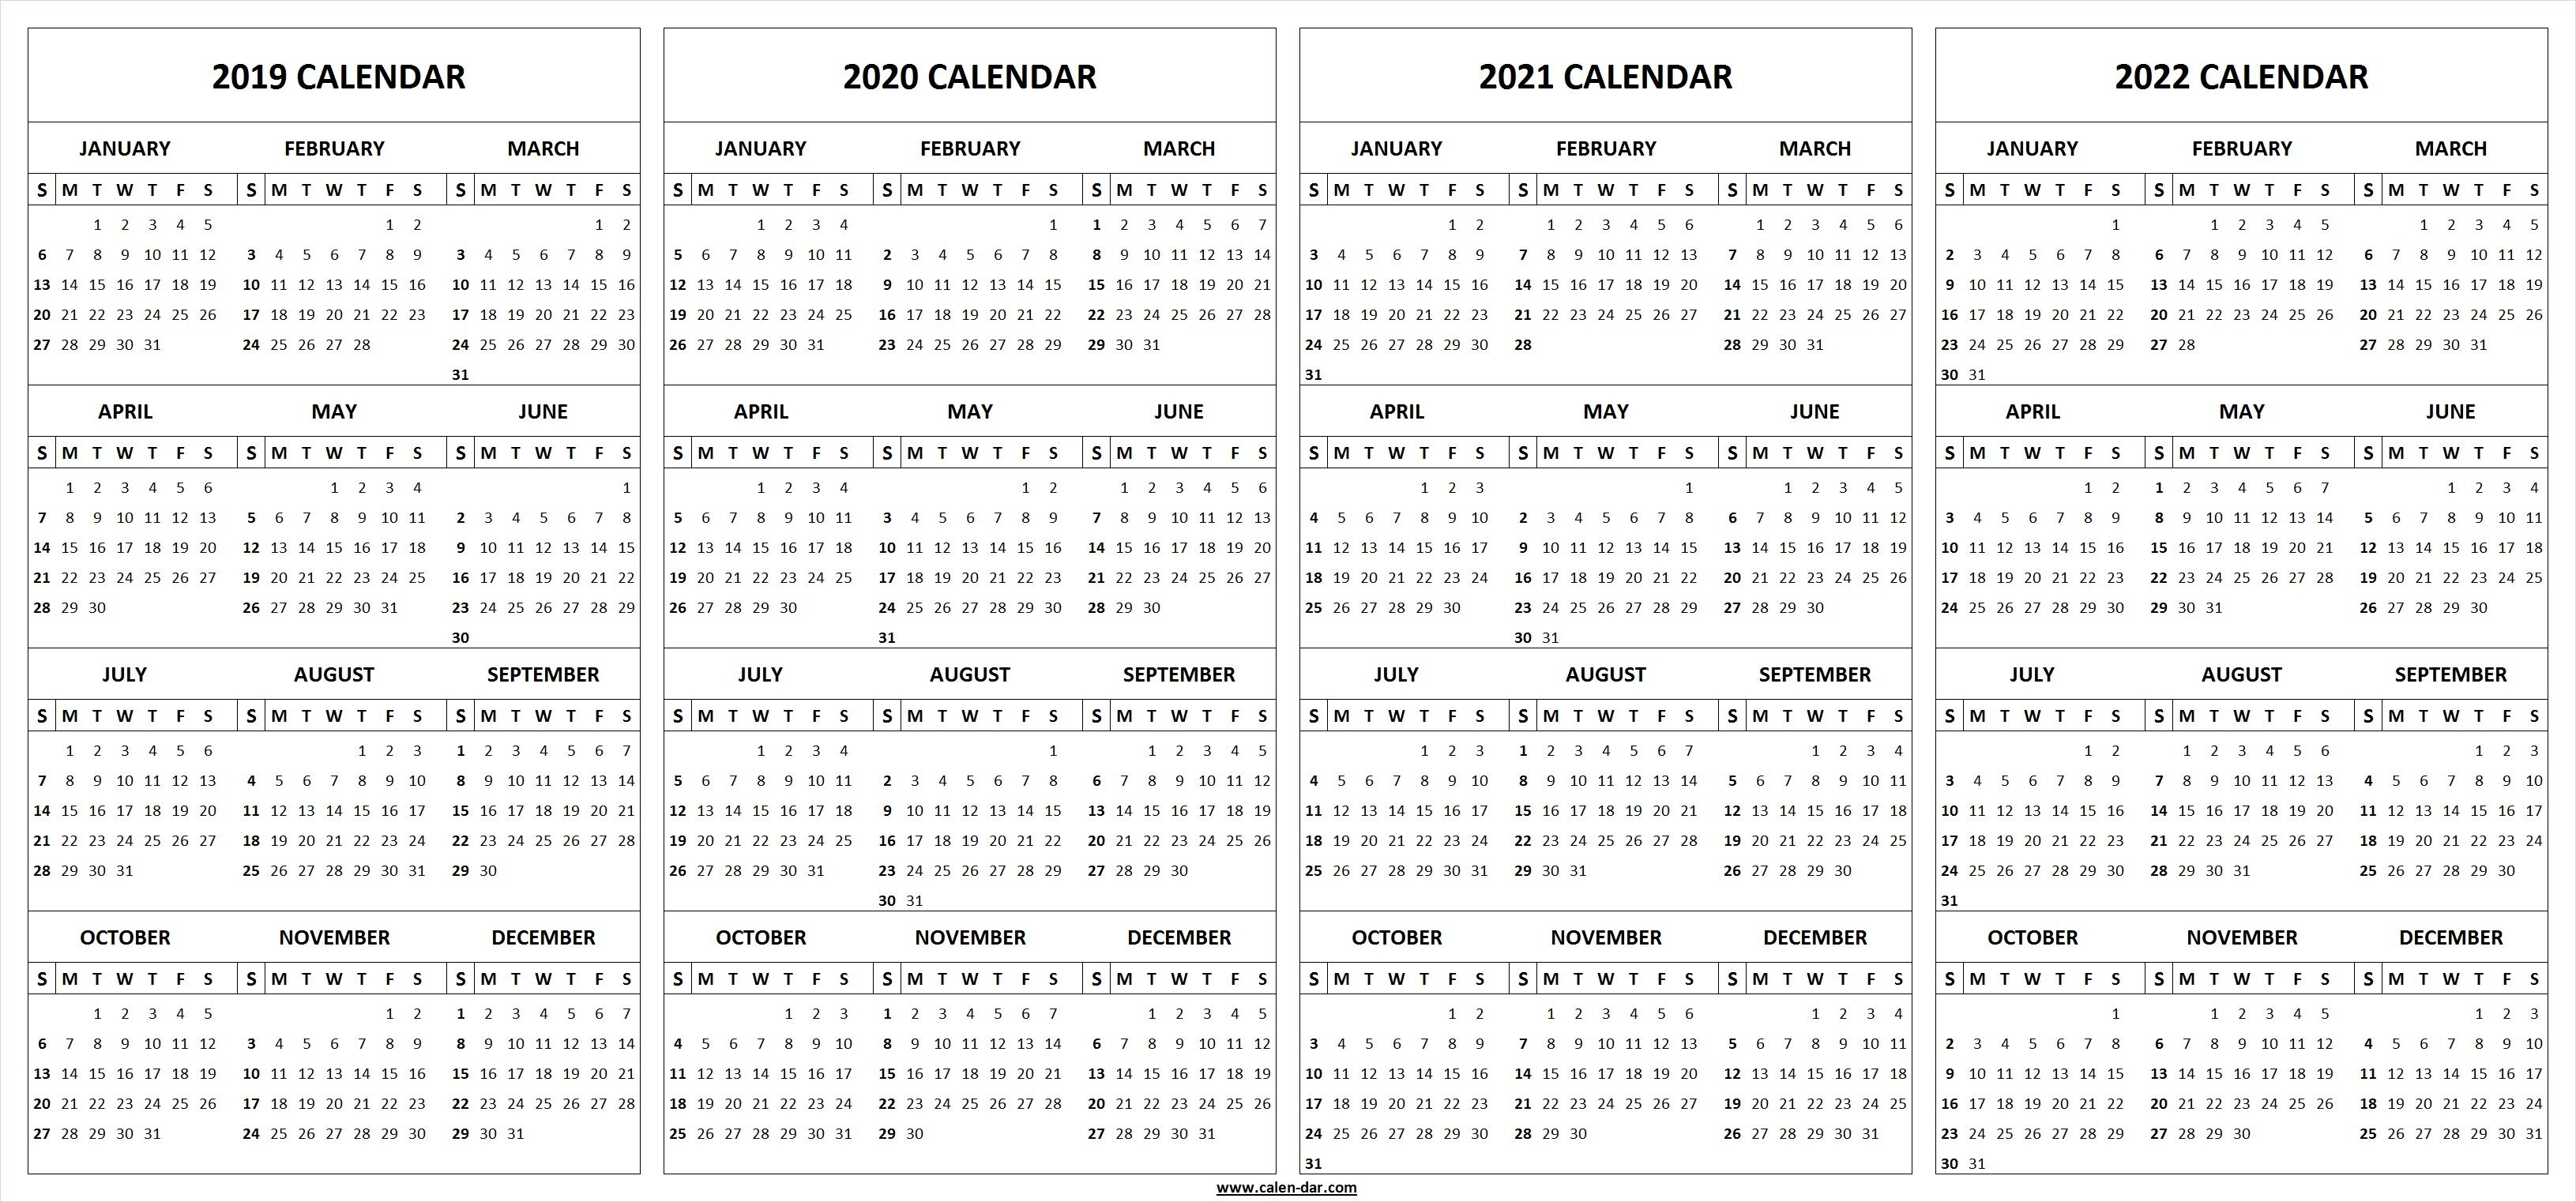 2019 2020 2021 2022 Calendar Blank Template | 2021 Calendar in 2019 2020 2021 2022 Calendars